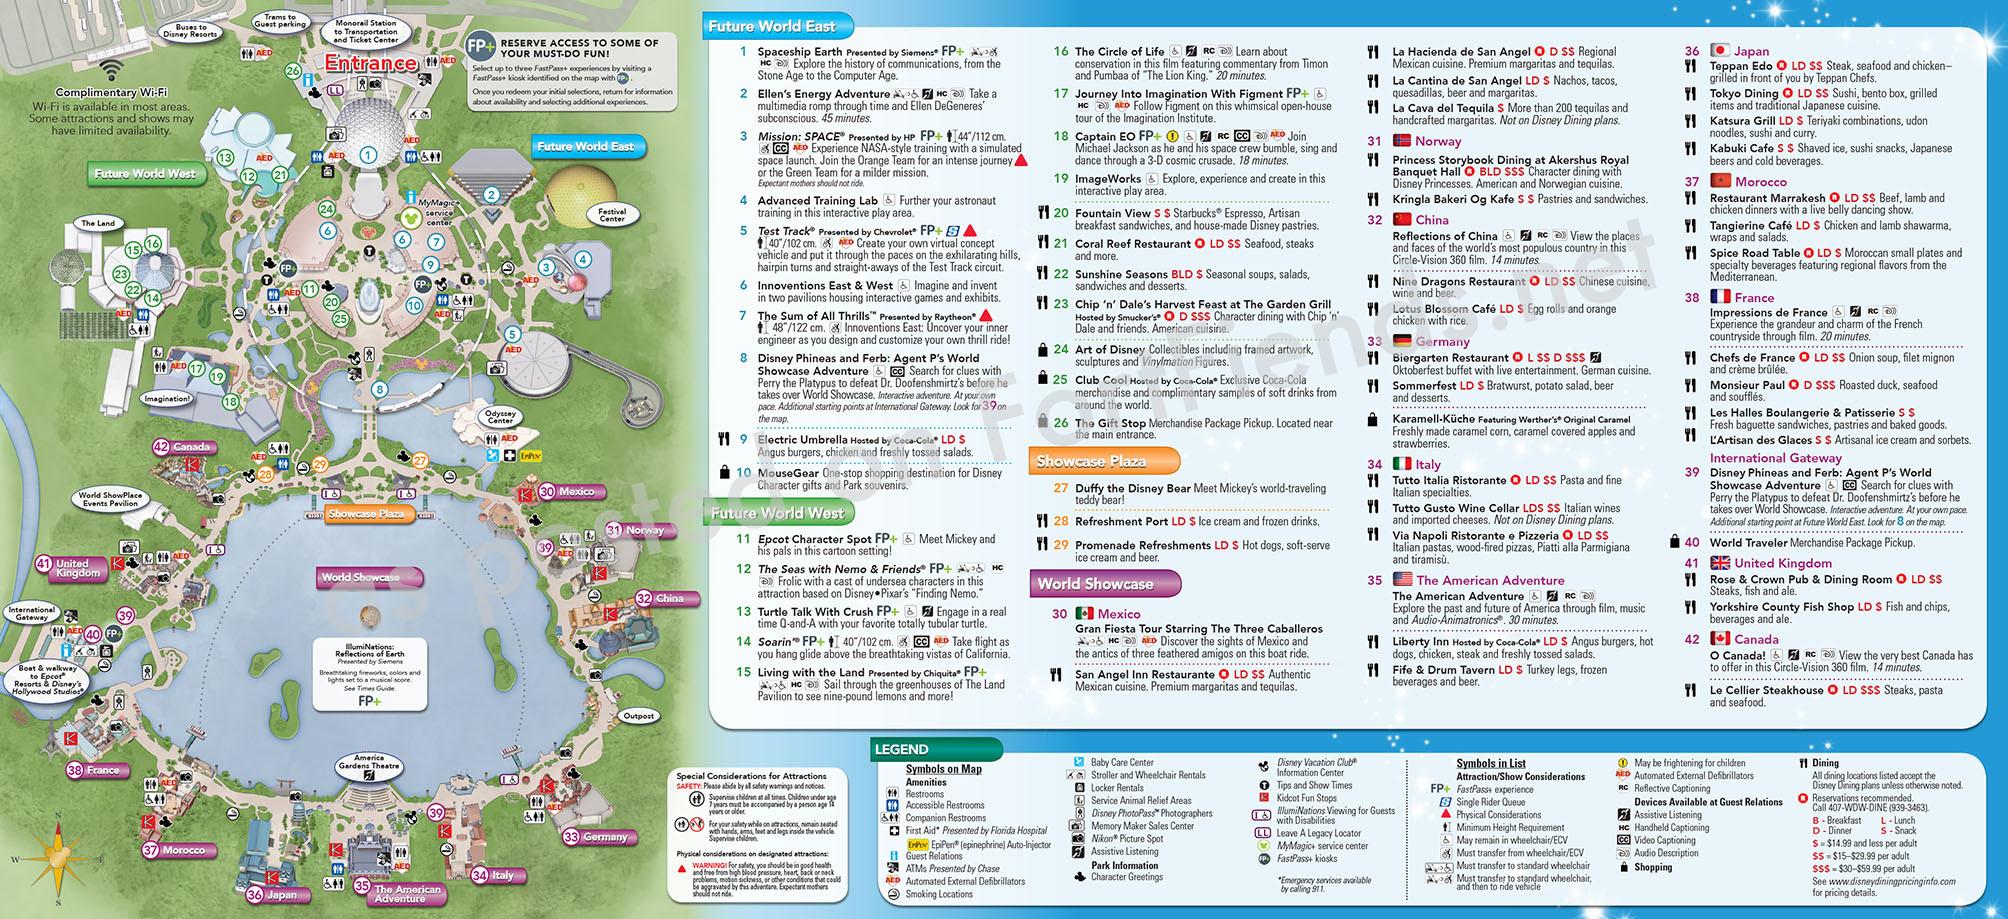 Park Map - Epcot (January 2015) - Park Maps - Fort Fiends  Disney World Attractions List Pdf